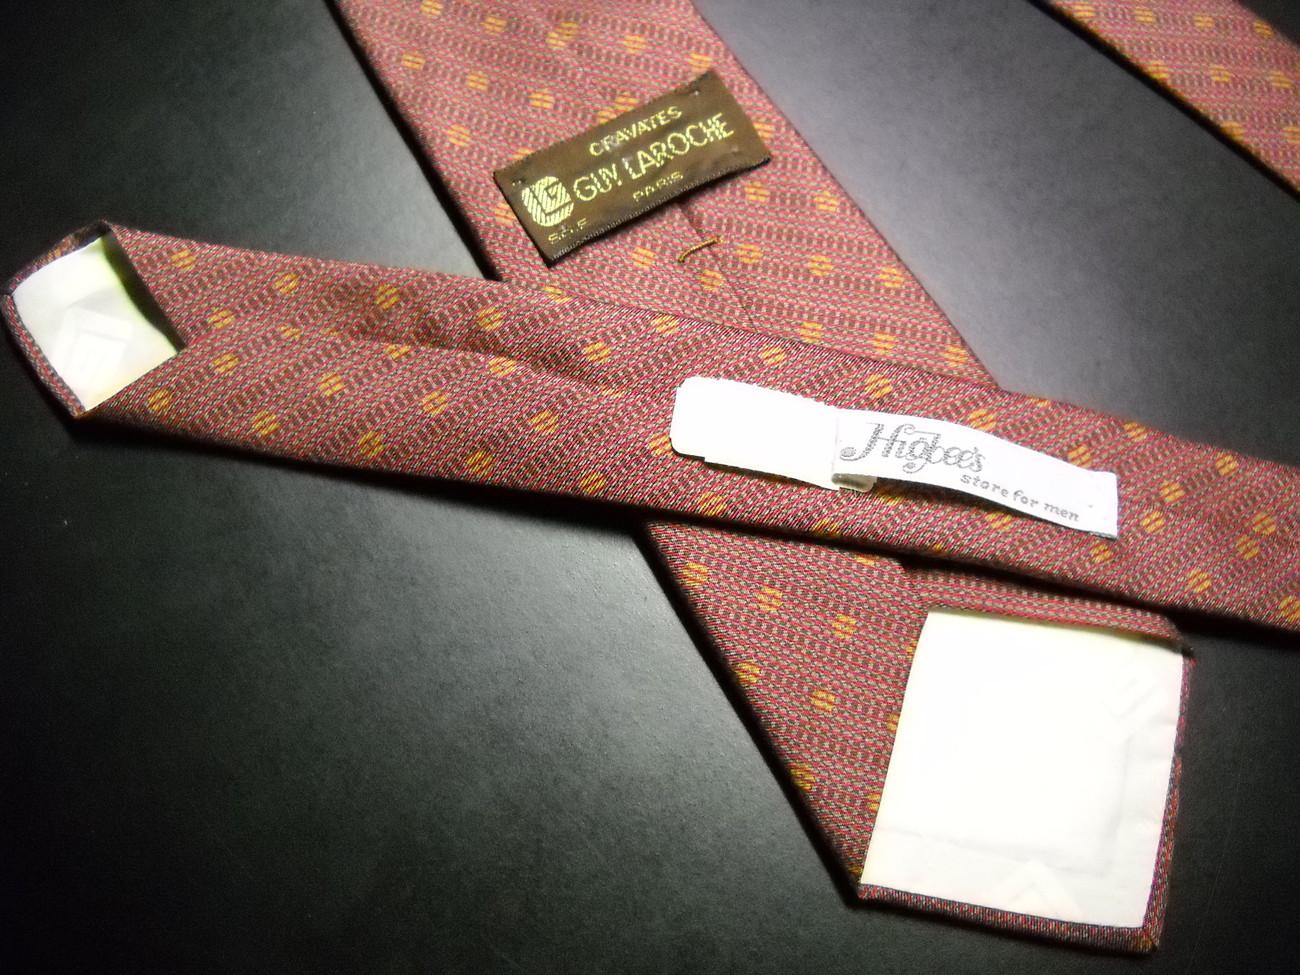 Guy Laroche Silk Dress Neck Tie Soft Browns 3 Inches at Widest Vintage